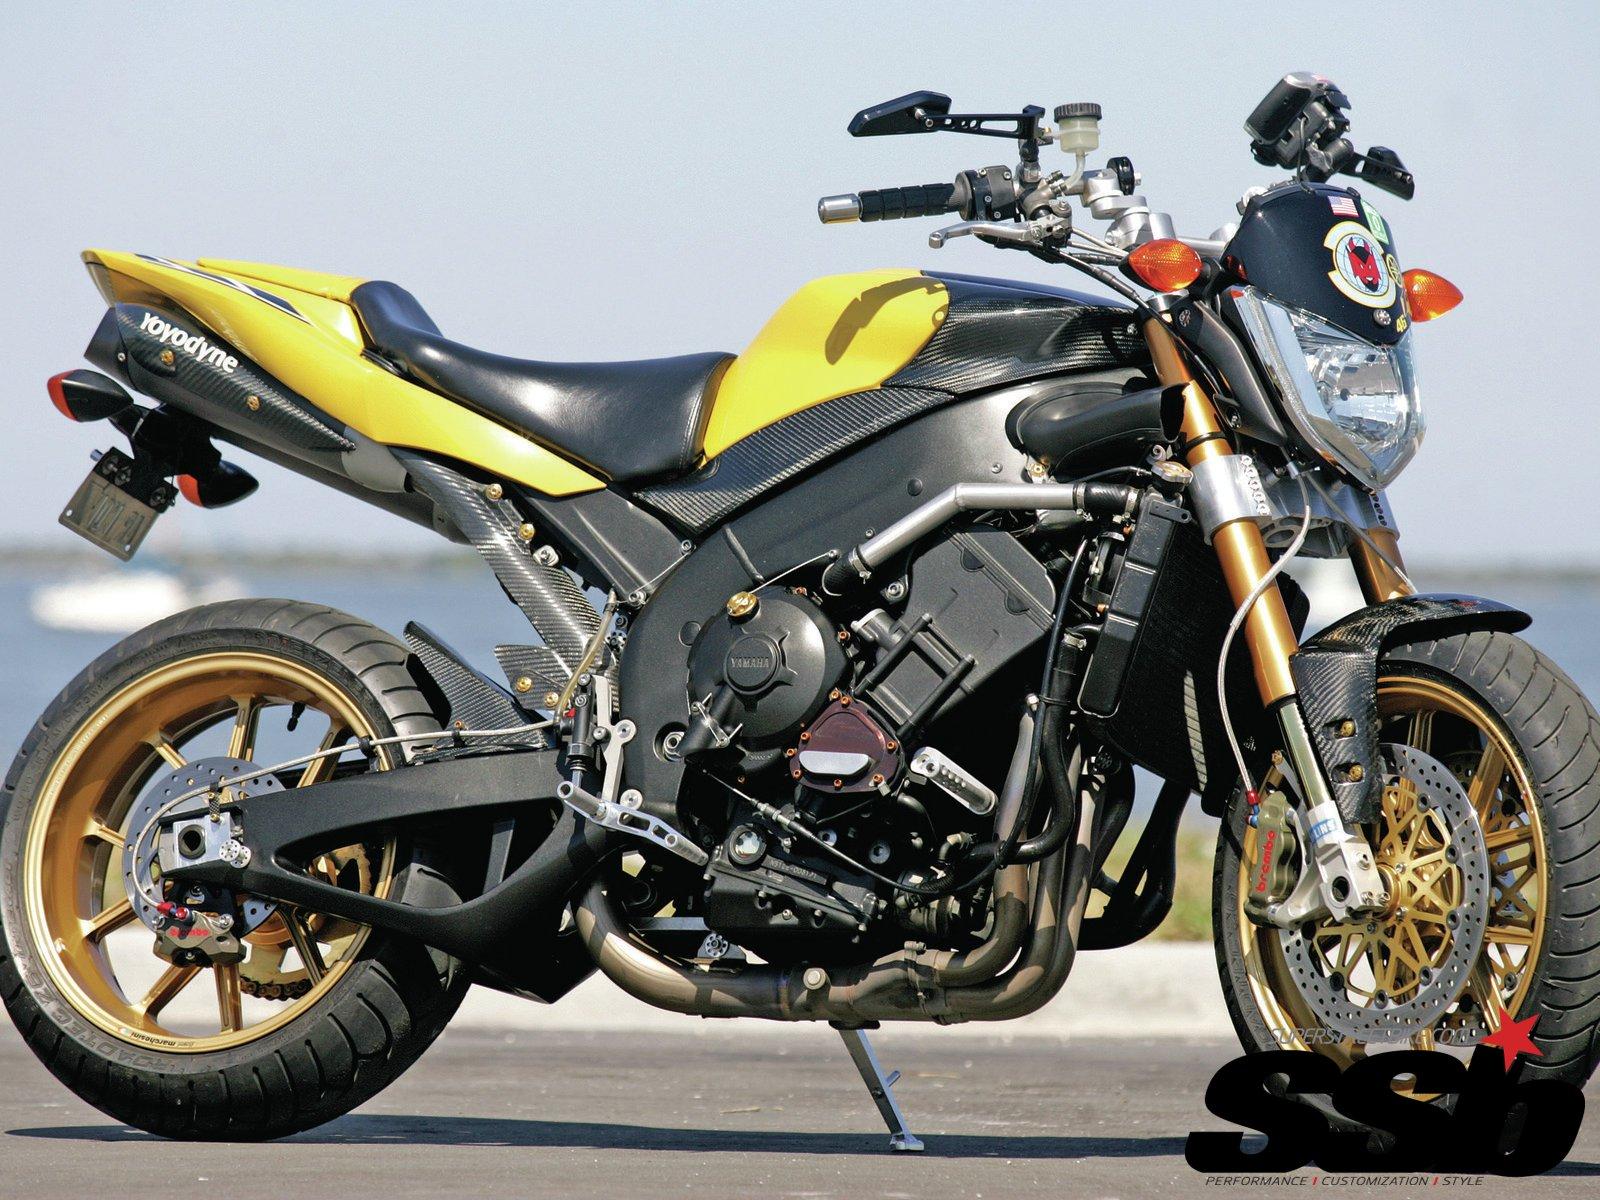 YAMAHA FZ1 motorbike motorcycle bike wallpaper 1600x1200 1600x1200